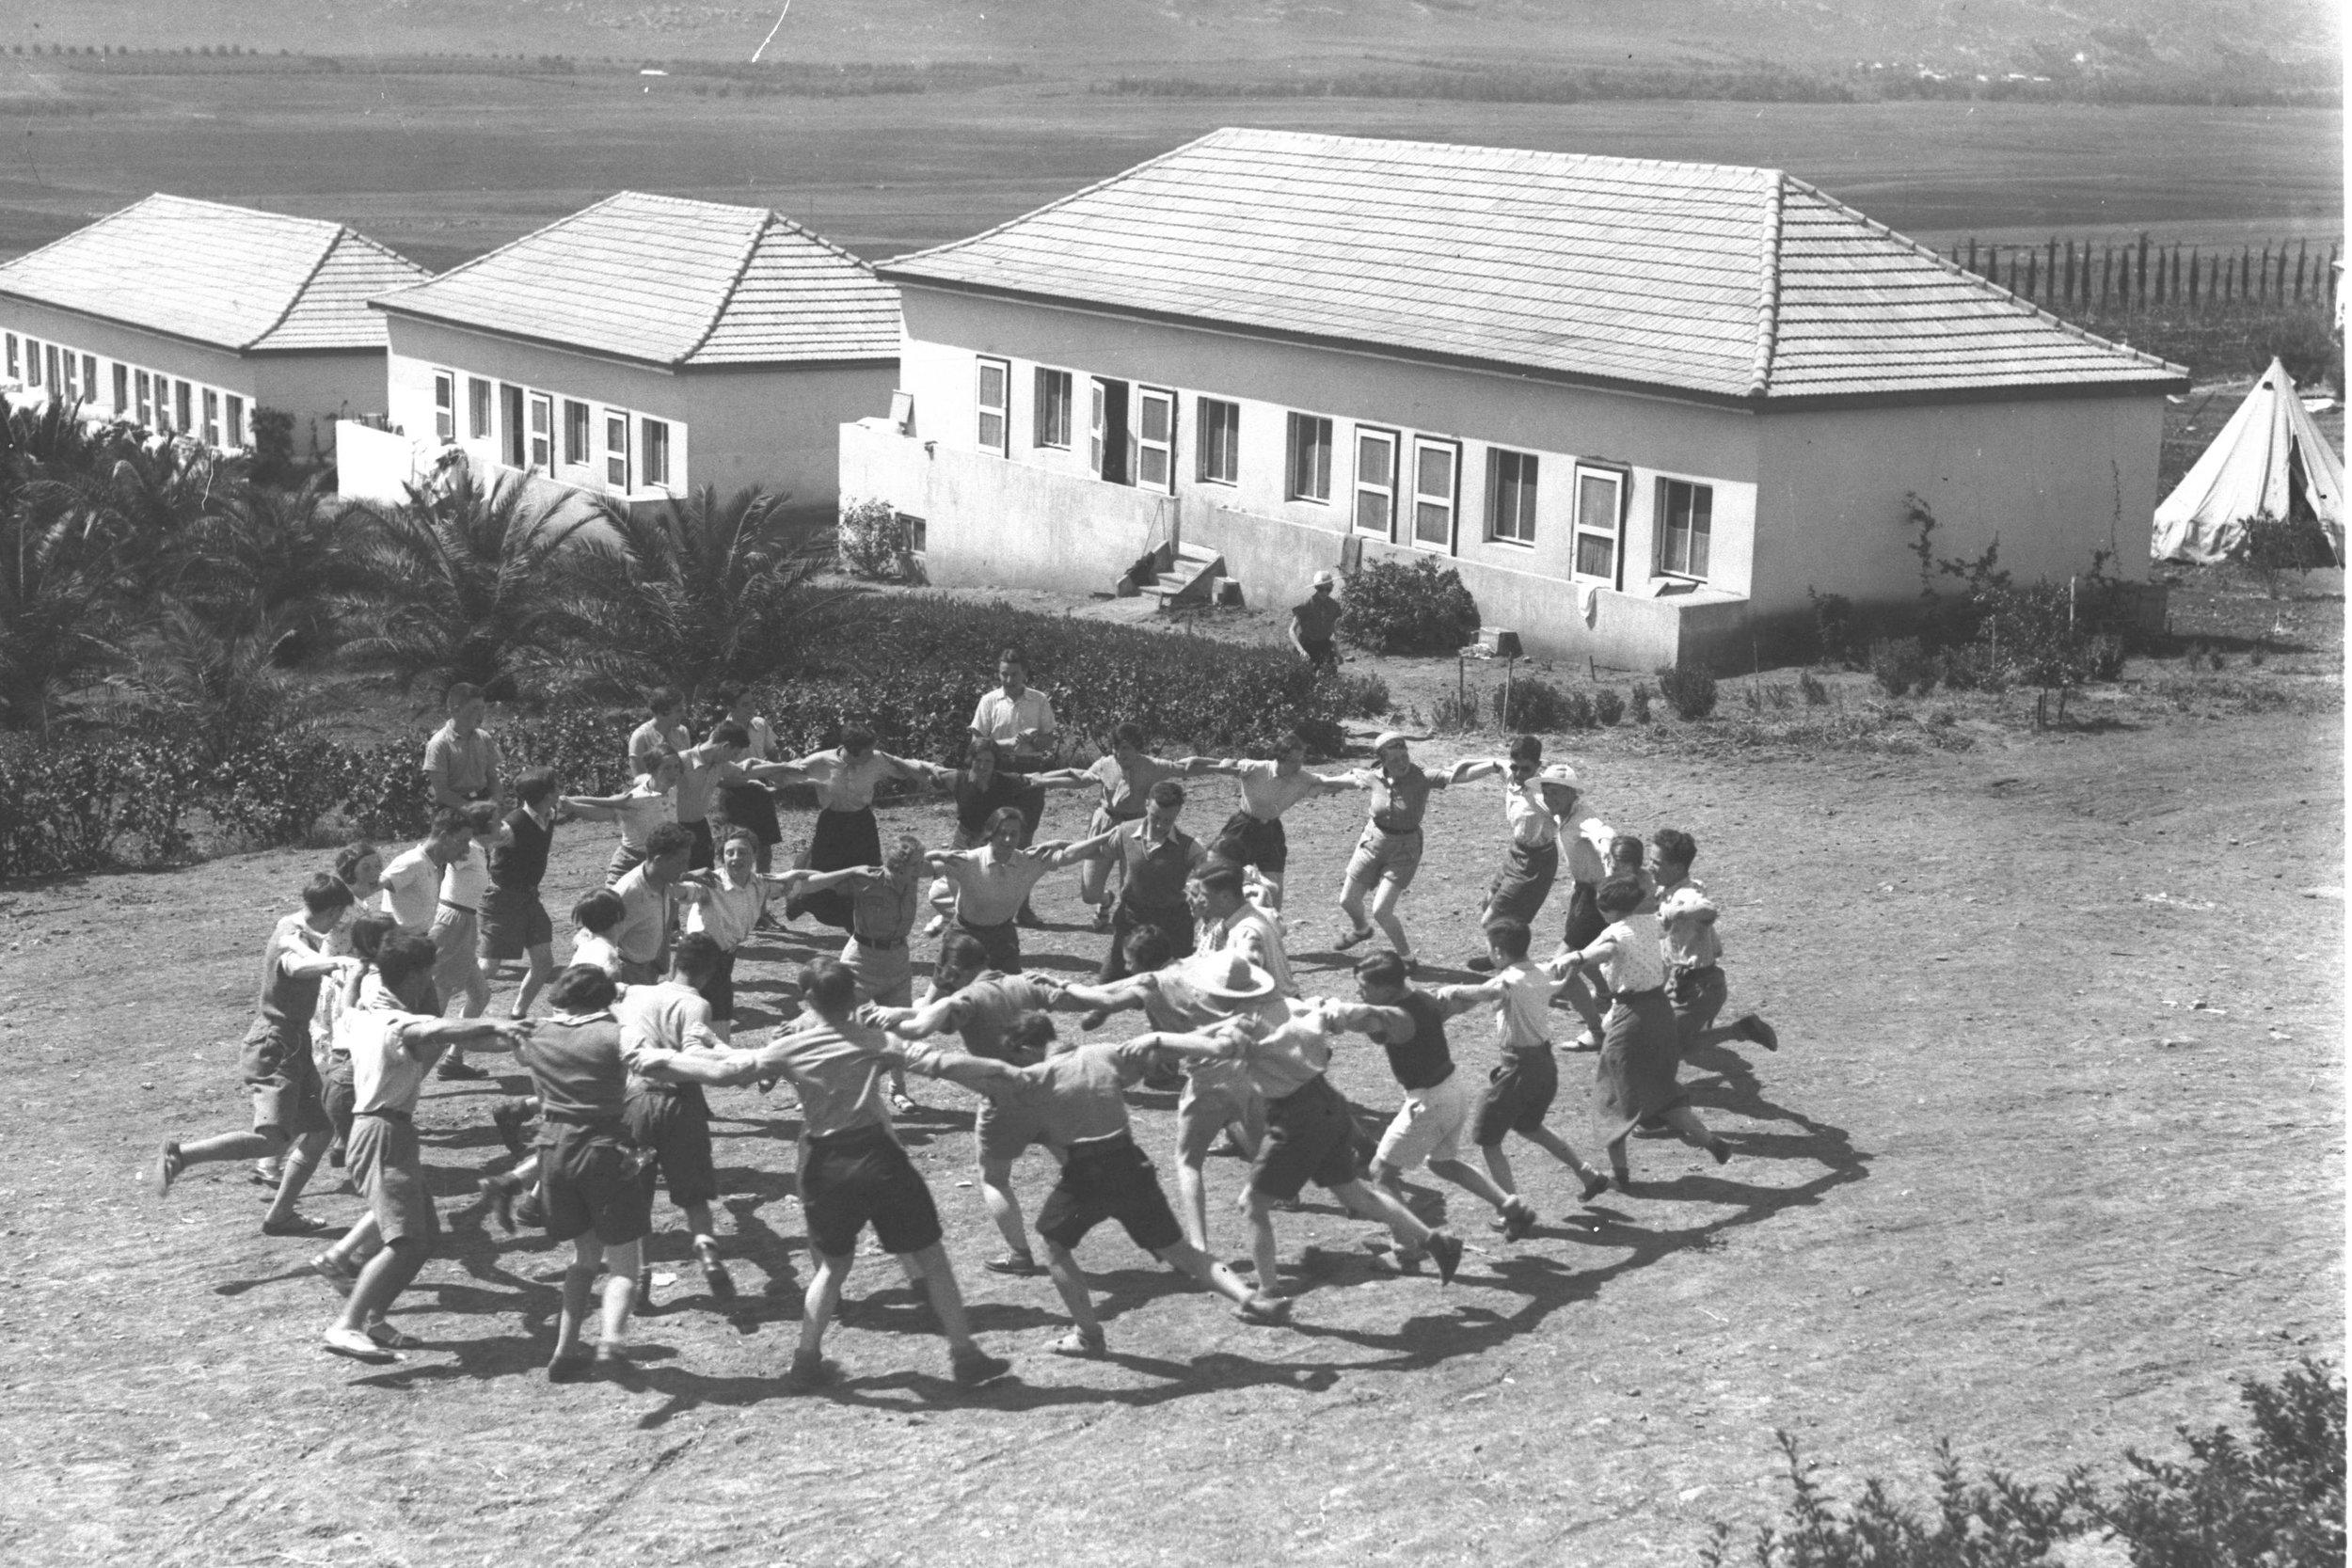 An unknown kibbutz. Photo source: Jewish Policy Center